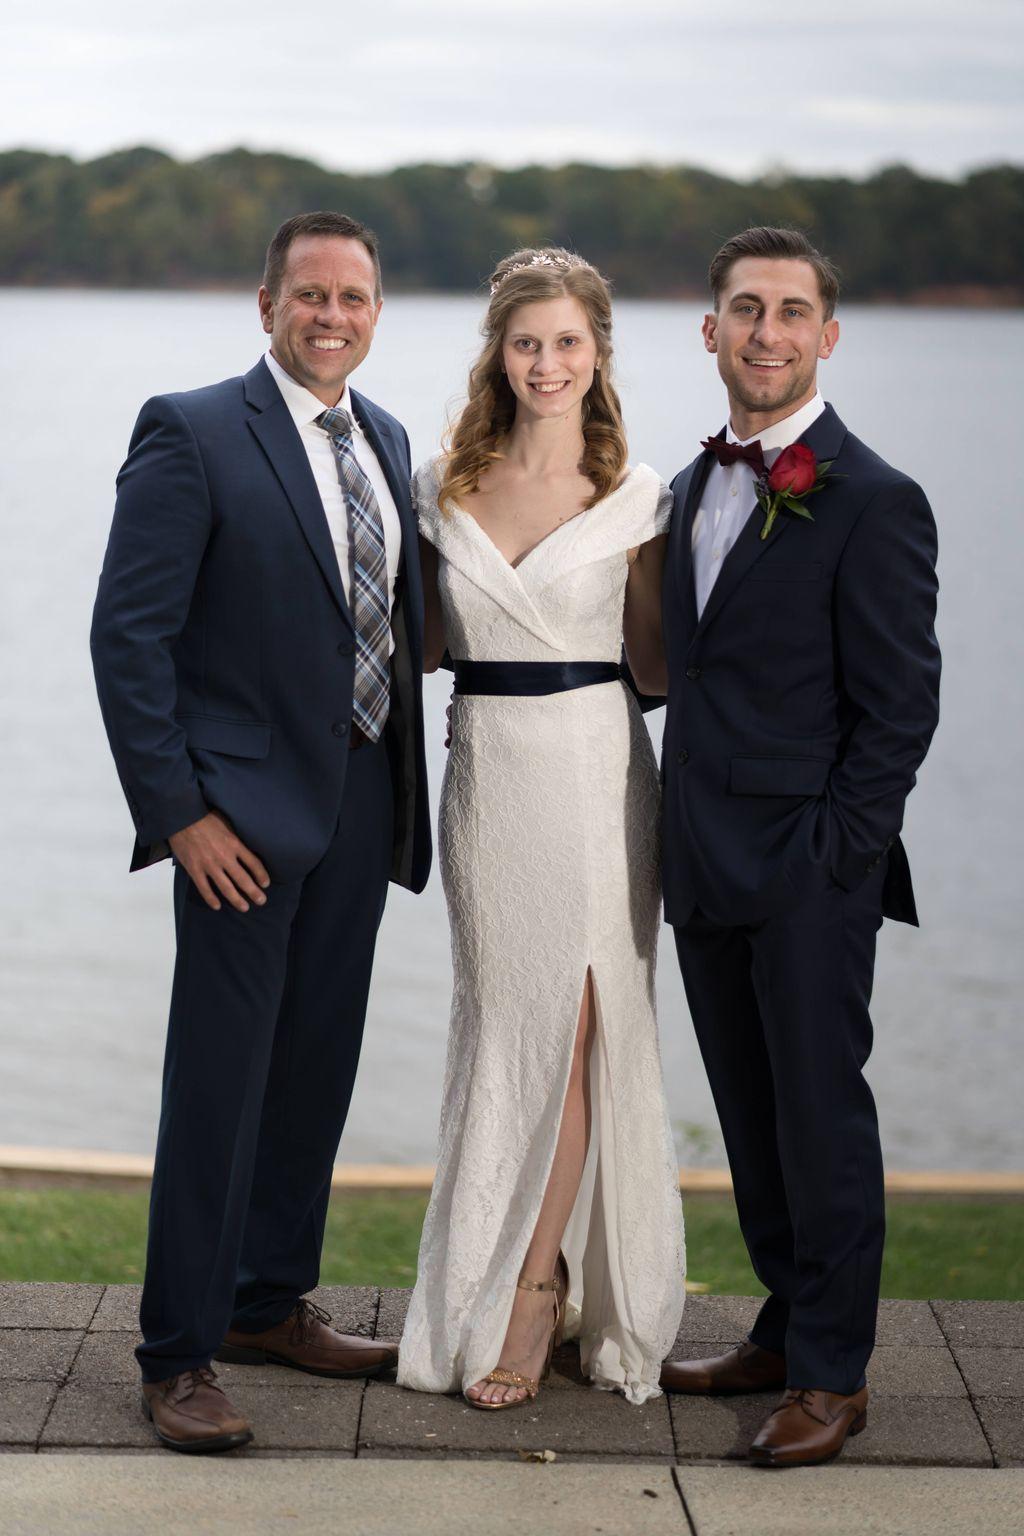 Wedding Officiant - Sherrills Ford 2019